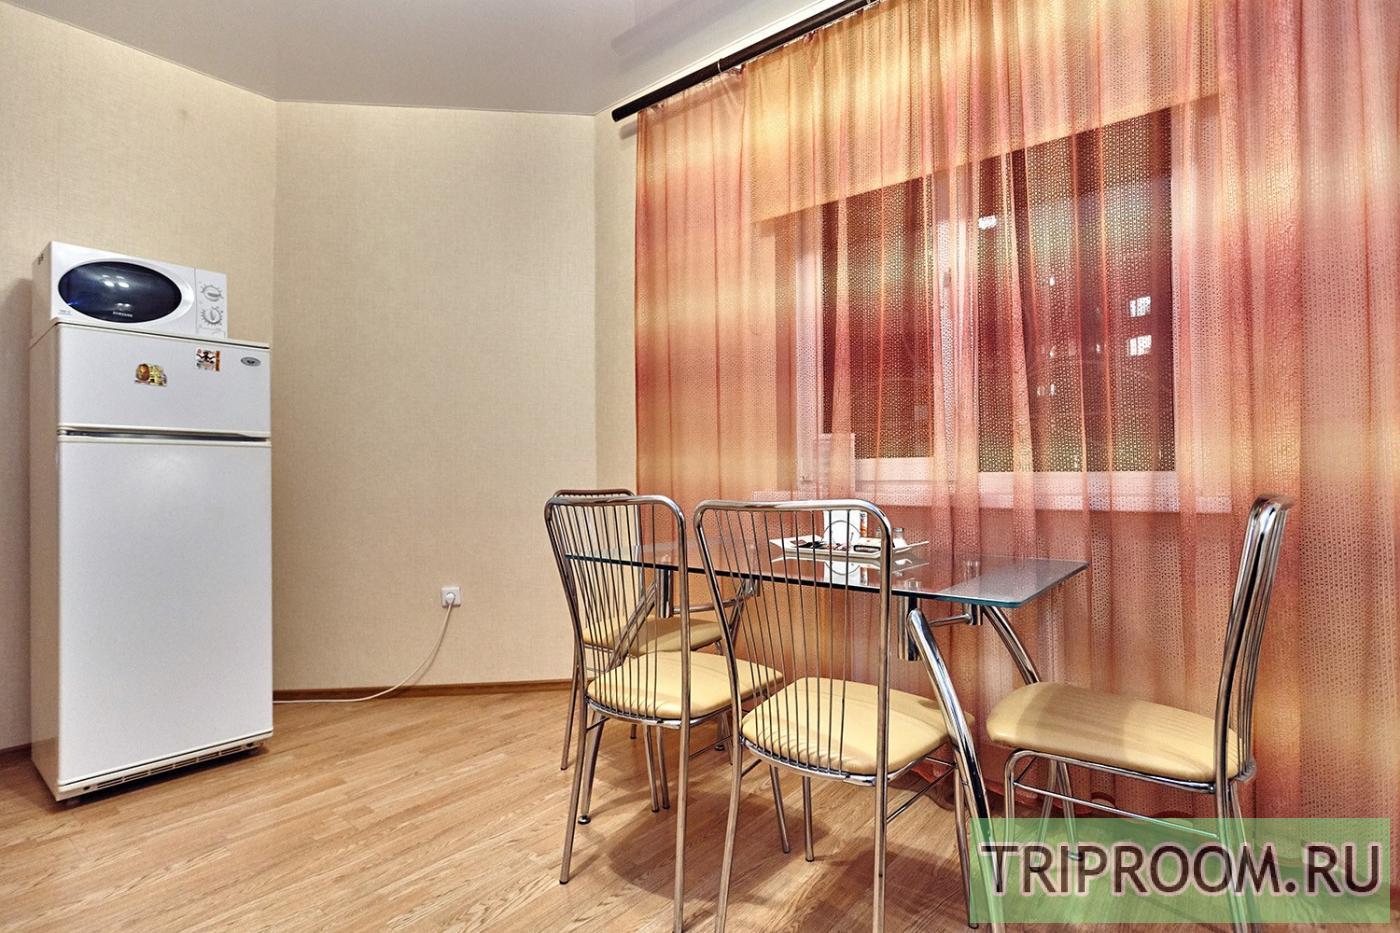 2-комнатная квартира посуточно (вариант № 10581), ул. Соколова улица, фото № 9